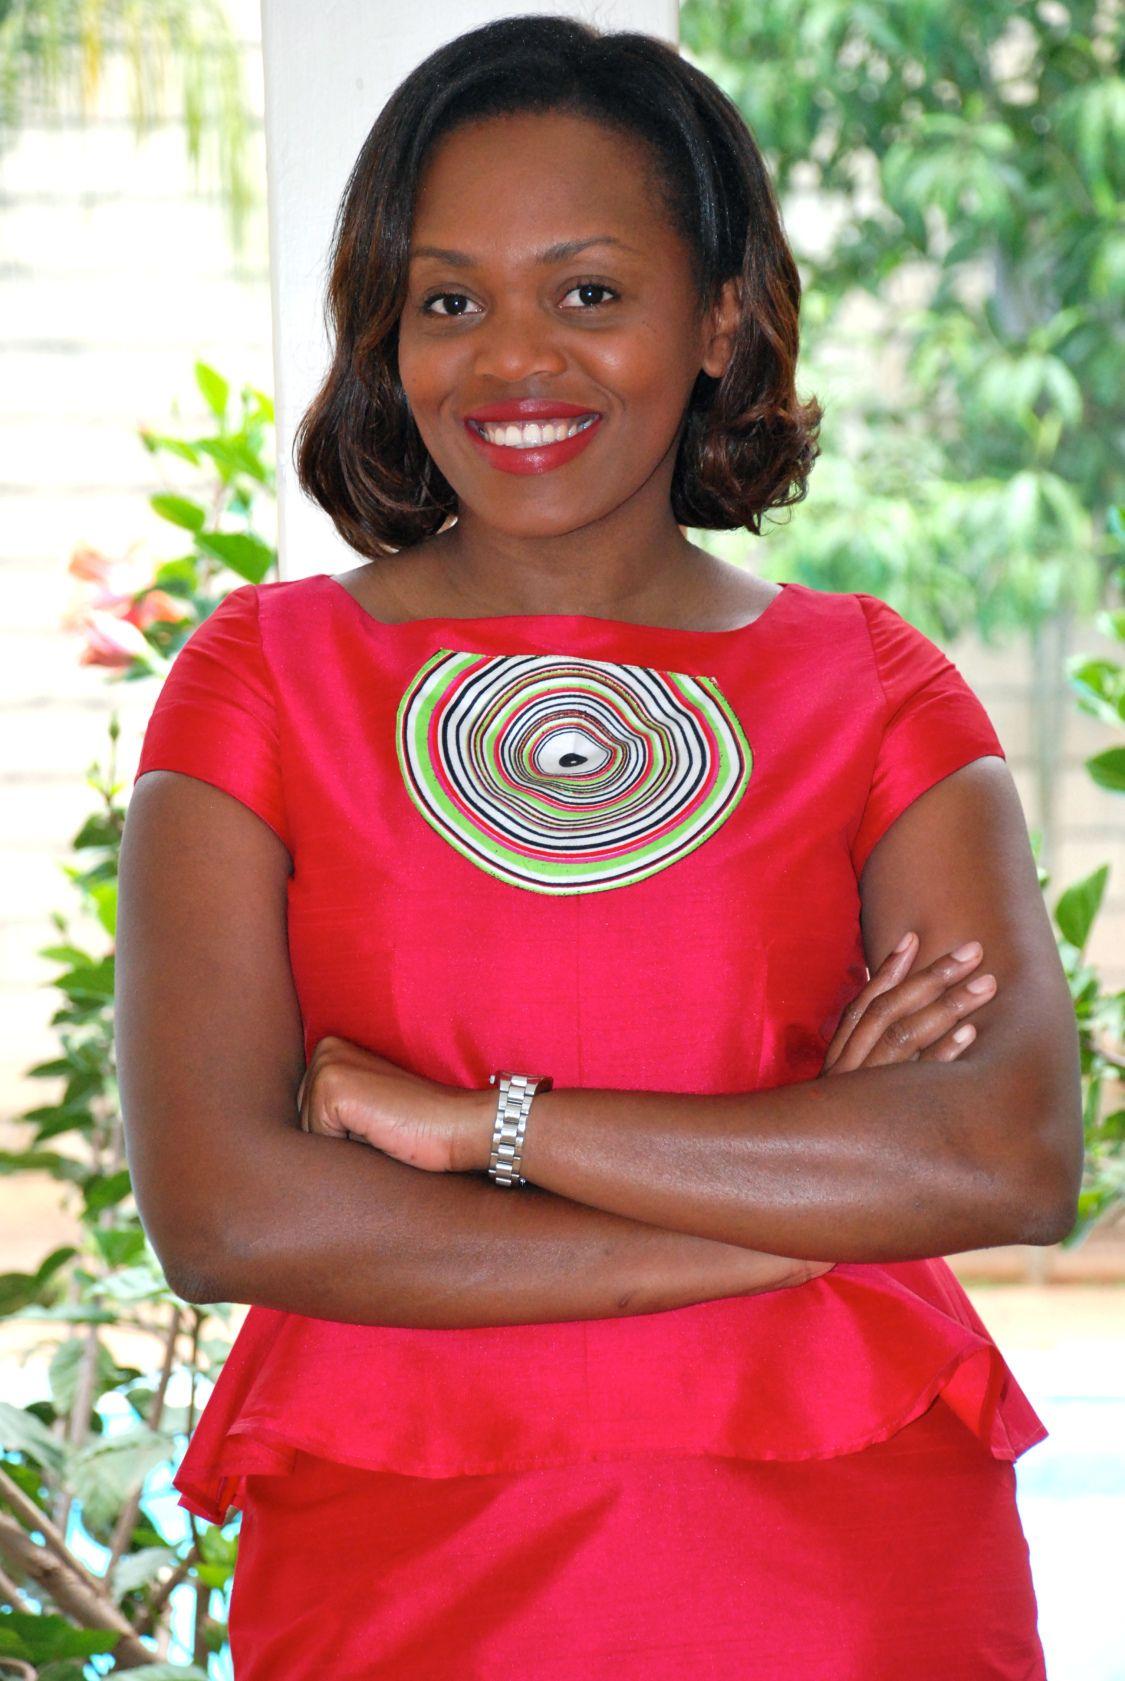 DAY 29: ELEGANCE | 100 Days Of African Fashion. #Africanfashion #AfricanWeddings #Africanprints #Ethnicprints #Africanwomen #africanTradition #AfricanArt #AfricanStyle #Kitenge #AfricanBeads #Gele #Kente #Ankara #Nigerianfashion #Ghanaianfashion #Kenyanfashion #Burundifashion #senegalesefashion #Swahilifashion ~DK